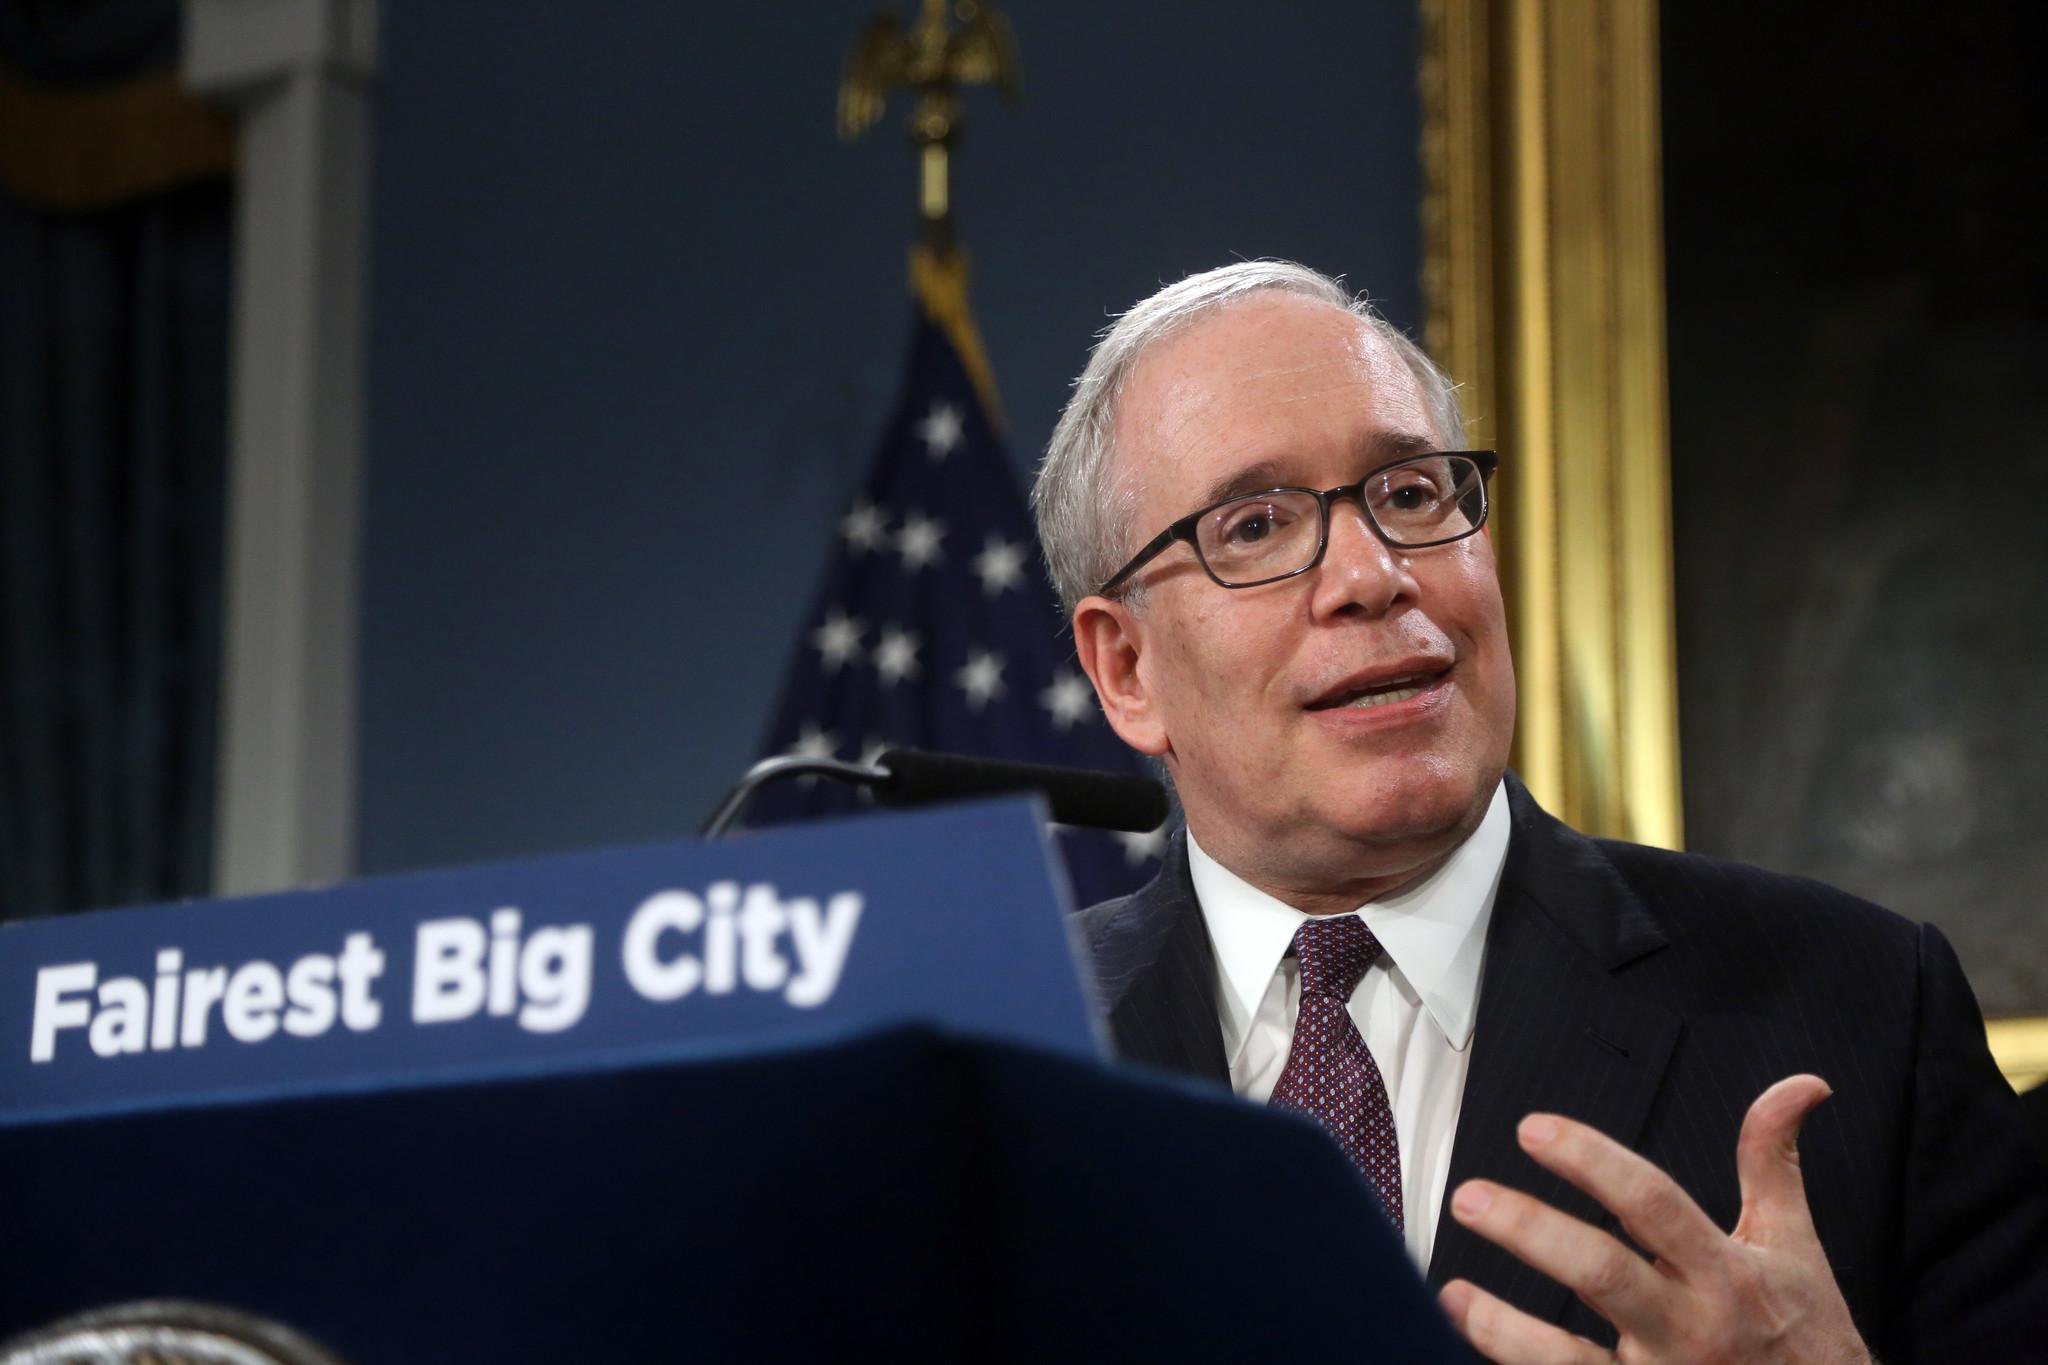 City Comptroller Scott Stringer calls on de Blasio to commit $1 billion per year to energy efficiency